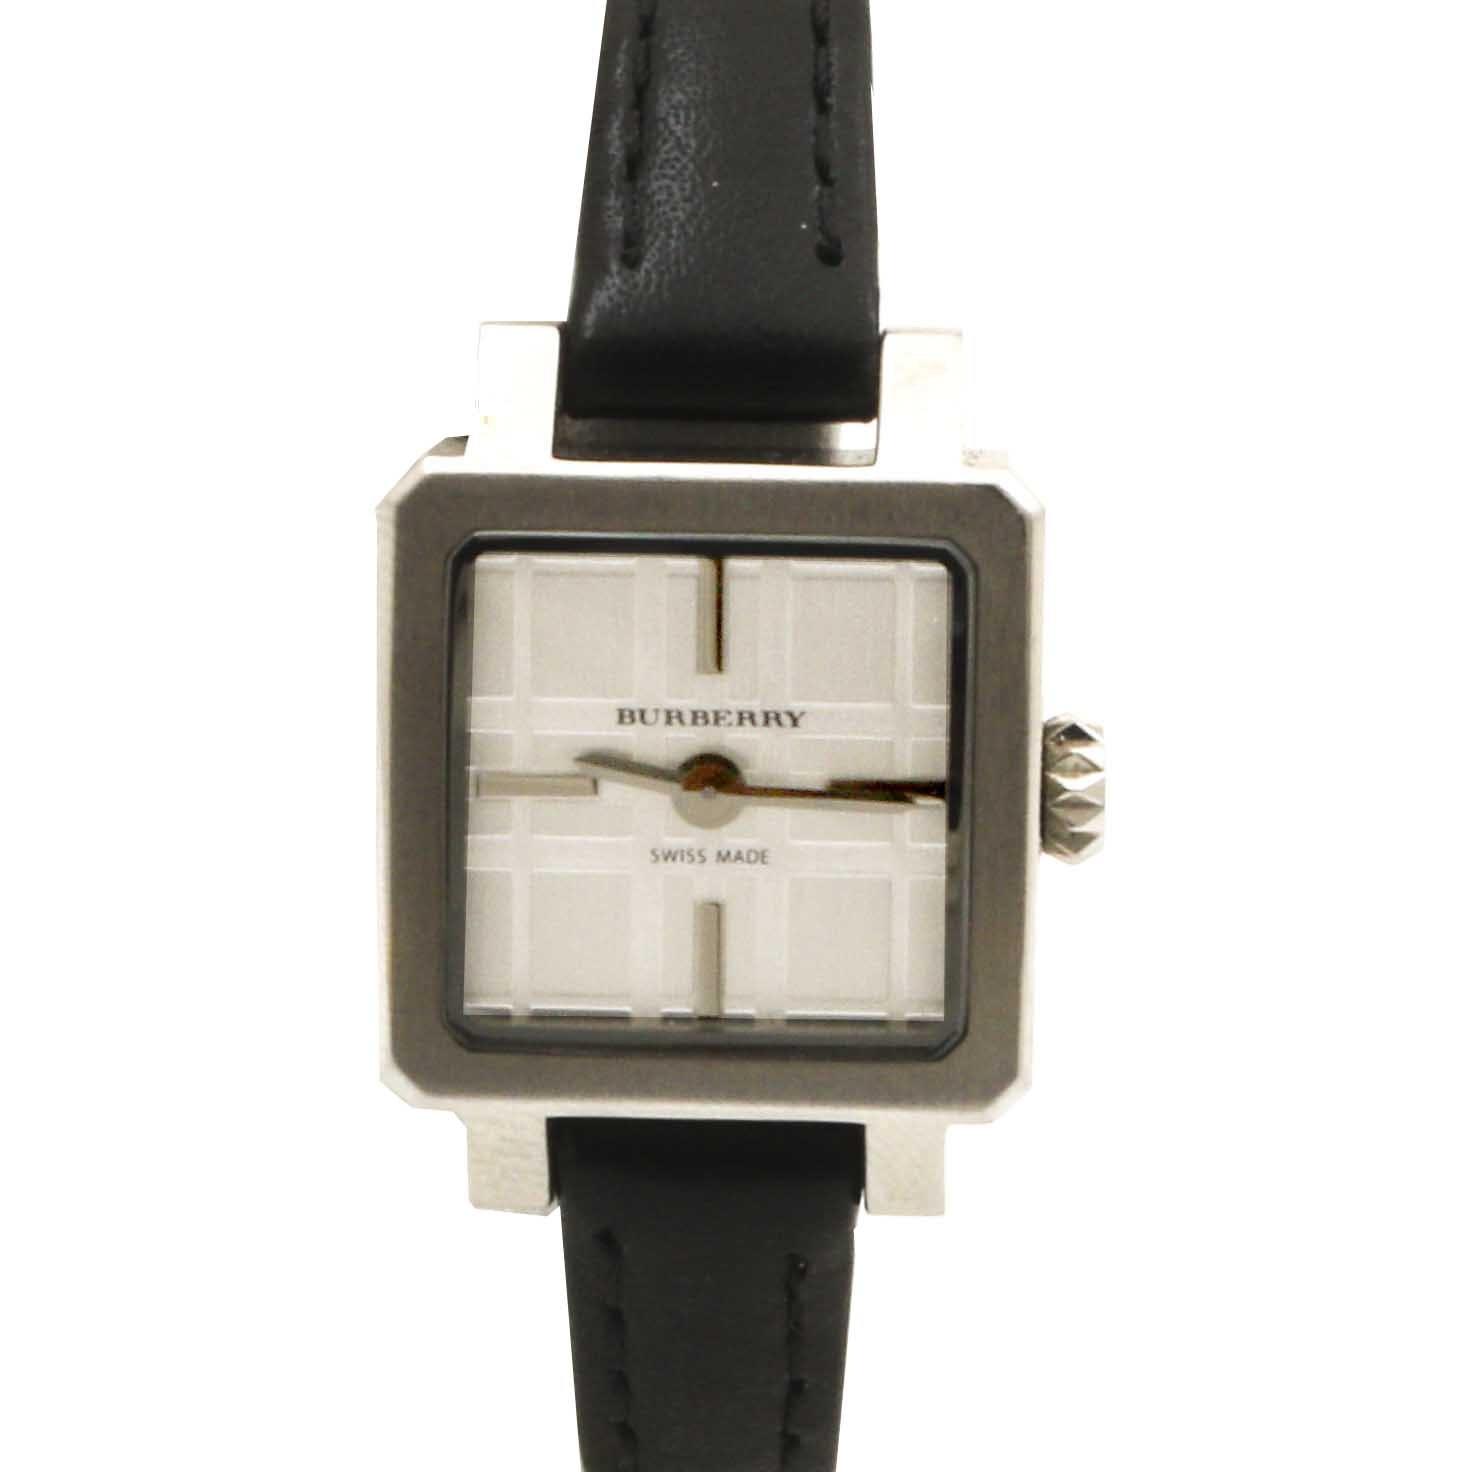 Burberry Swiss Made Stainless Steel Wristwatch